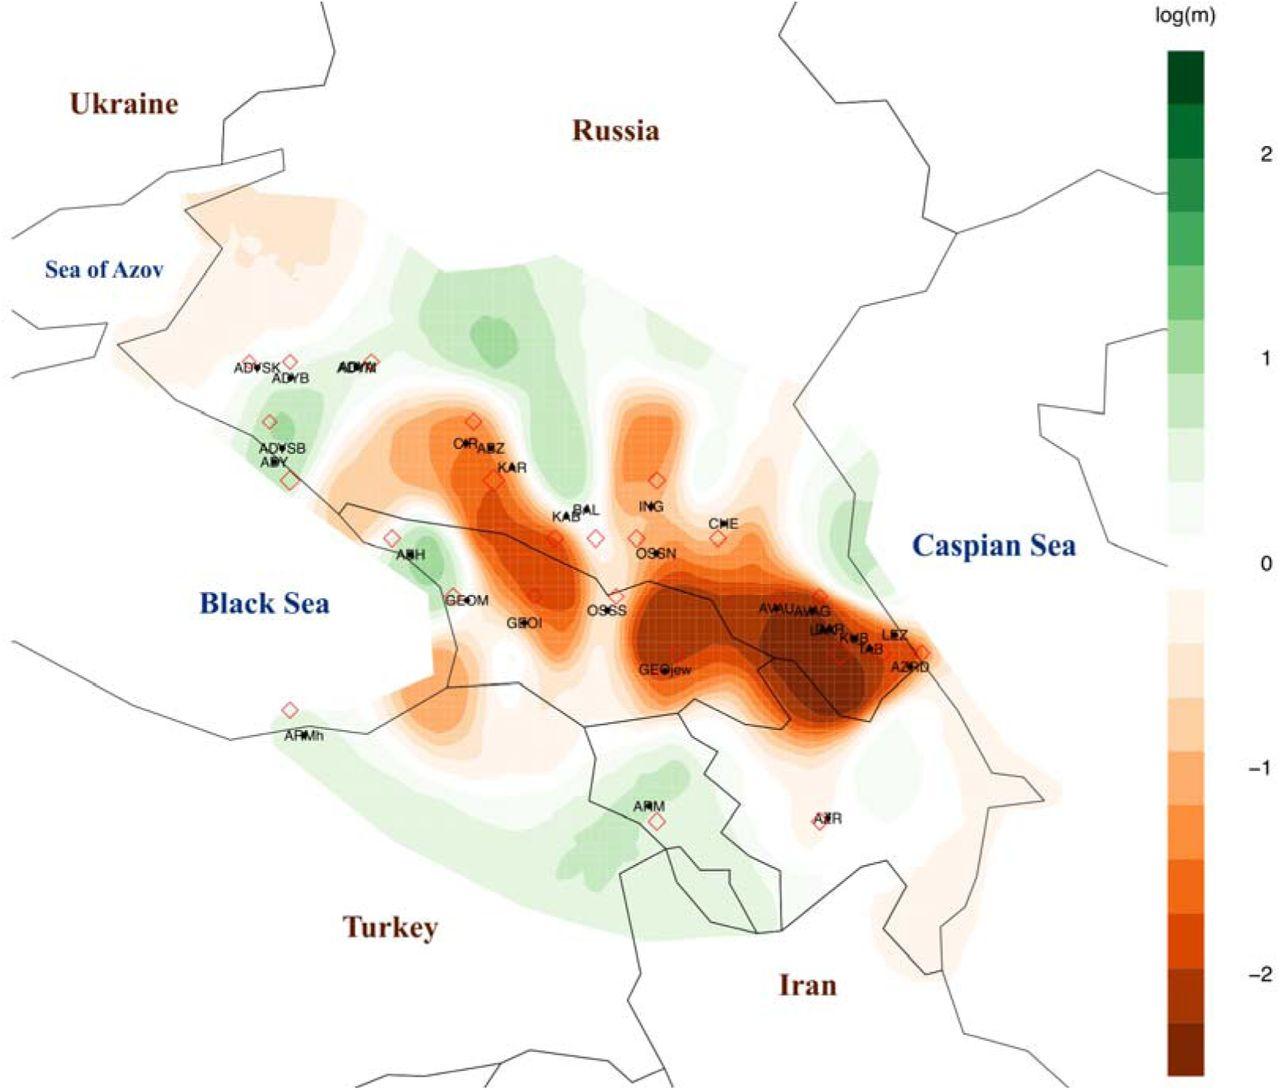 Characterizing the genetic history of admixture across inner Eurasia